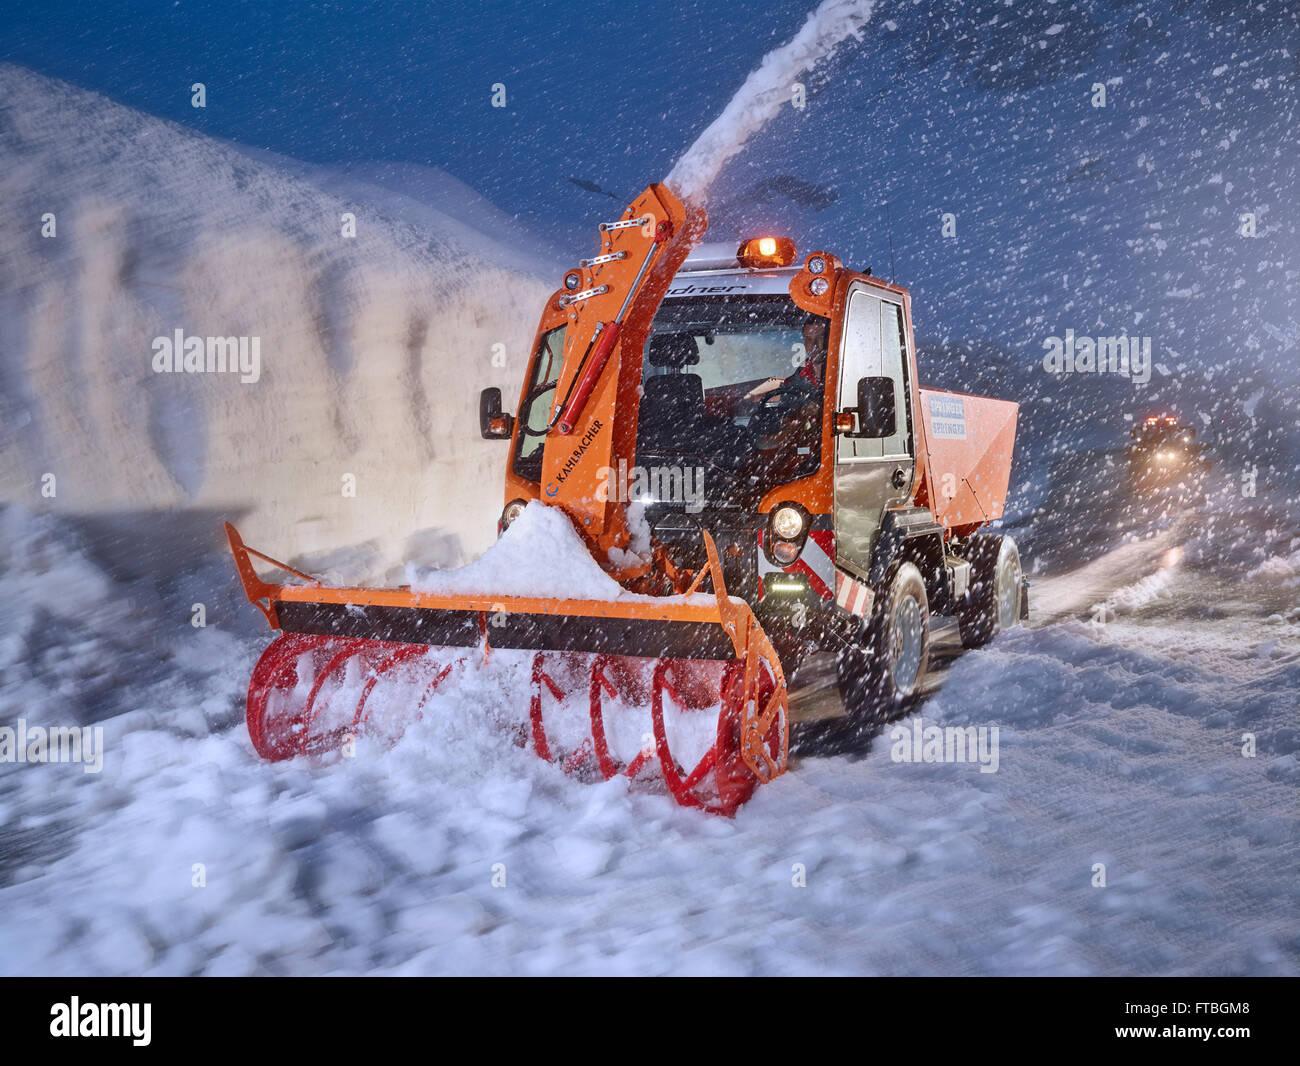 Snowplow removing snow, winter maintenance, Hochgurgl, Ötztal, Tyrol, Austria - Stock Image